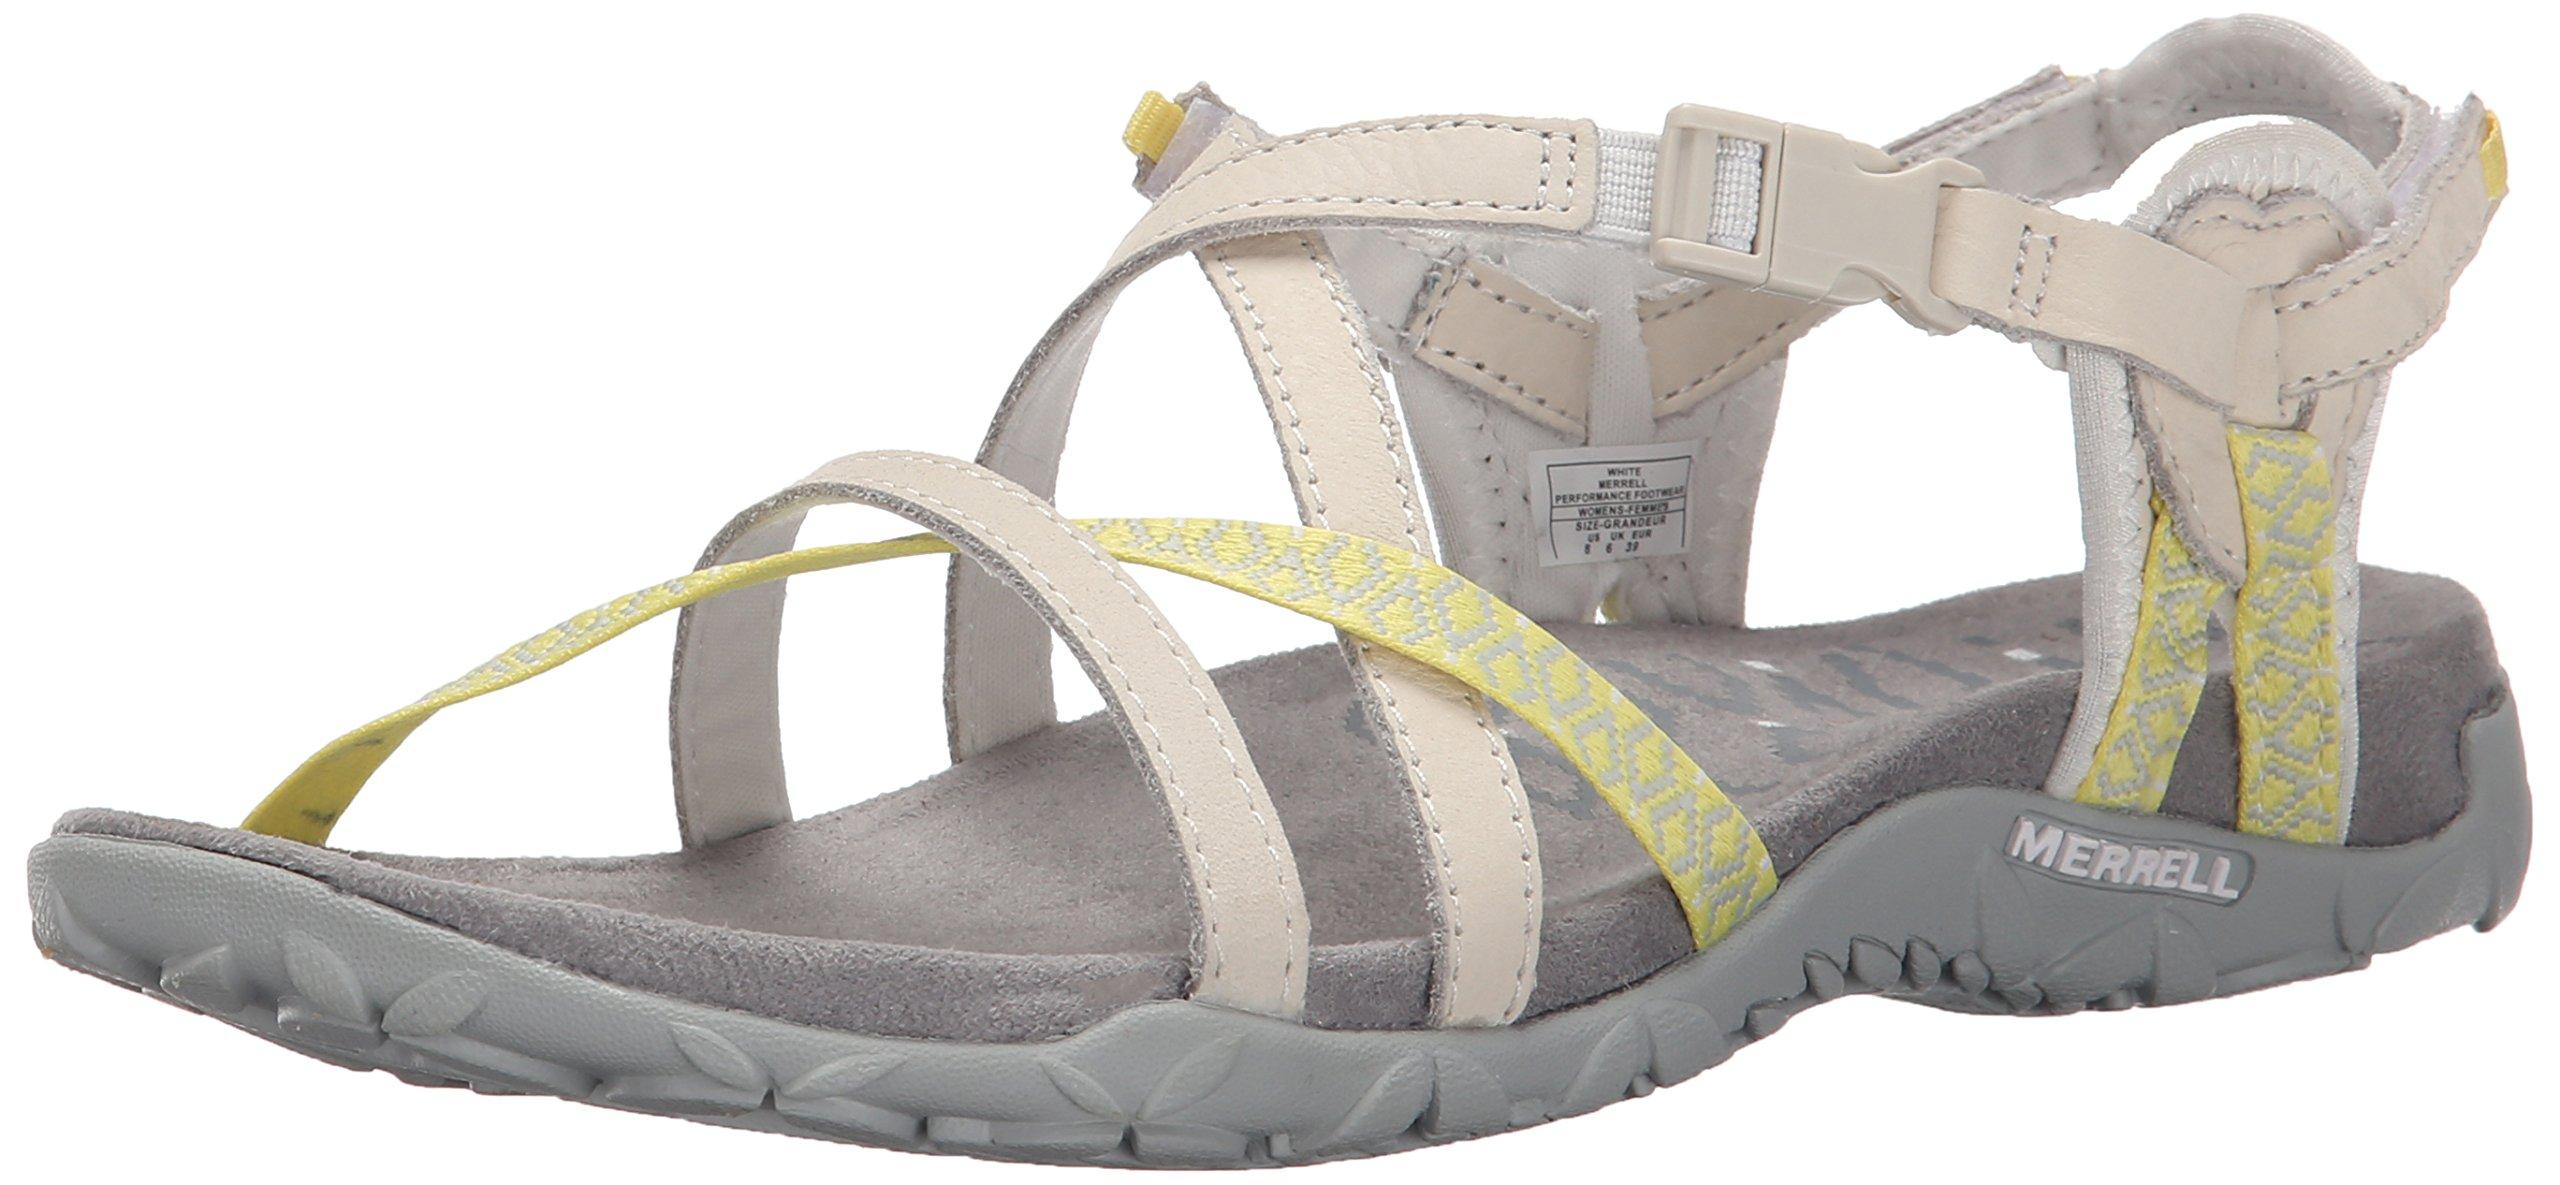 Merrell Women's Terran Lattice II Sandal, White, 9 M US